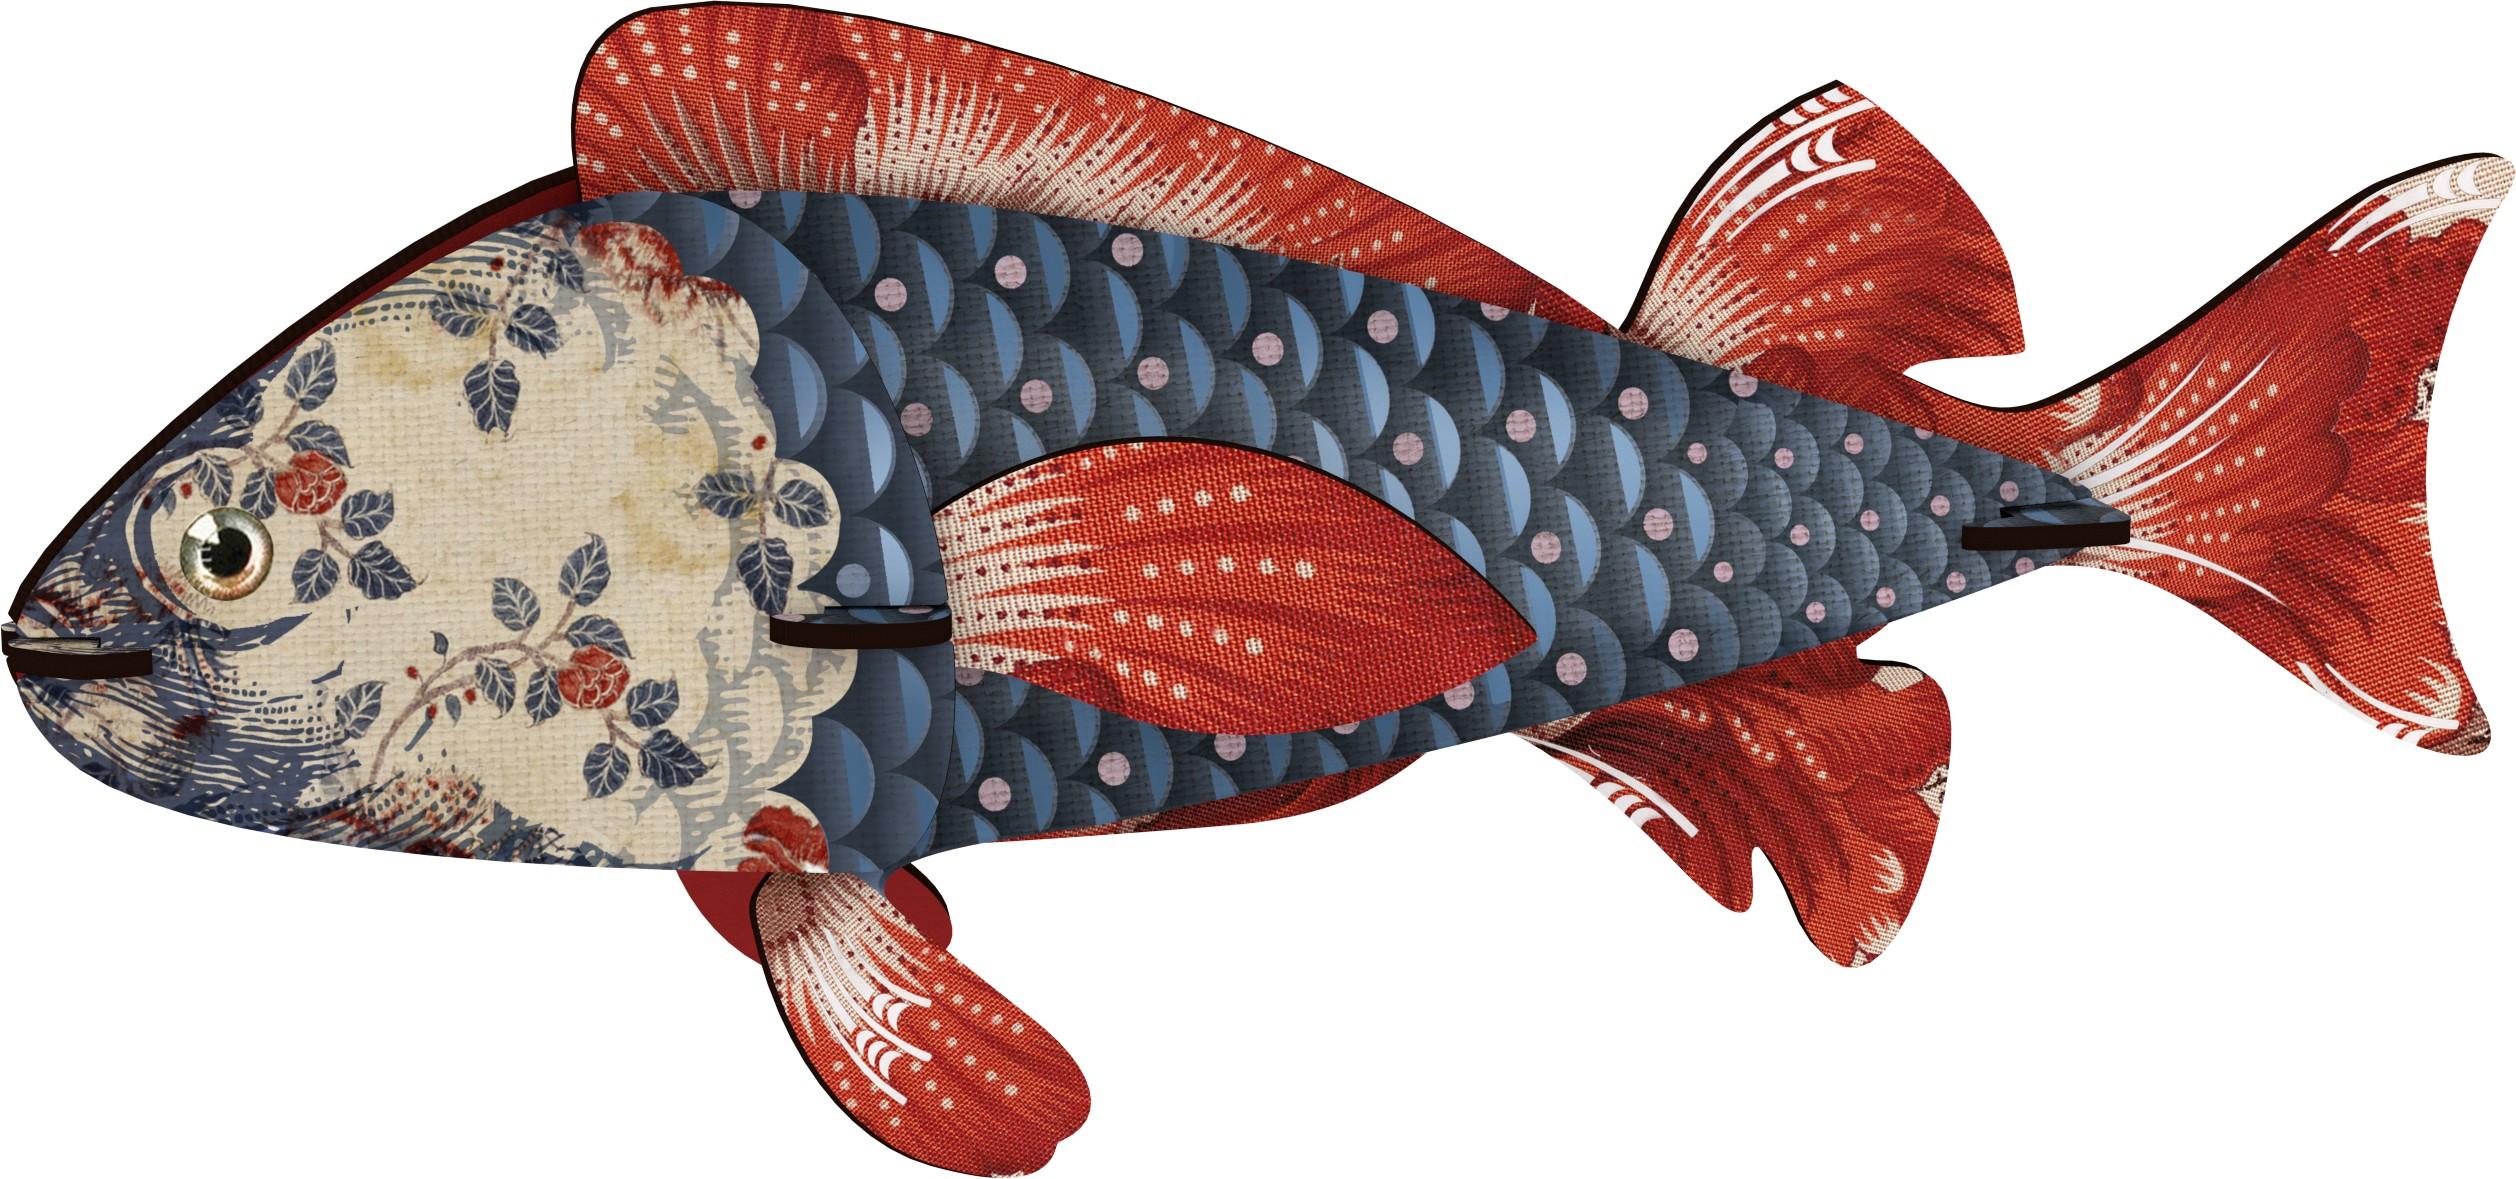 miho | Accessories | FISH-MHEARTBREAKER